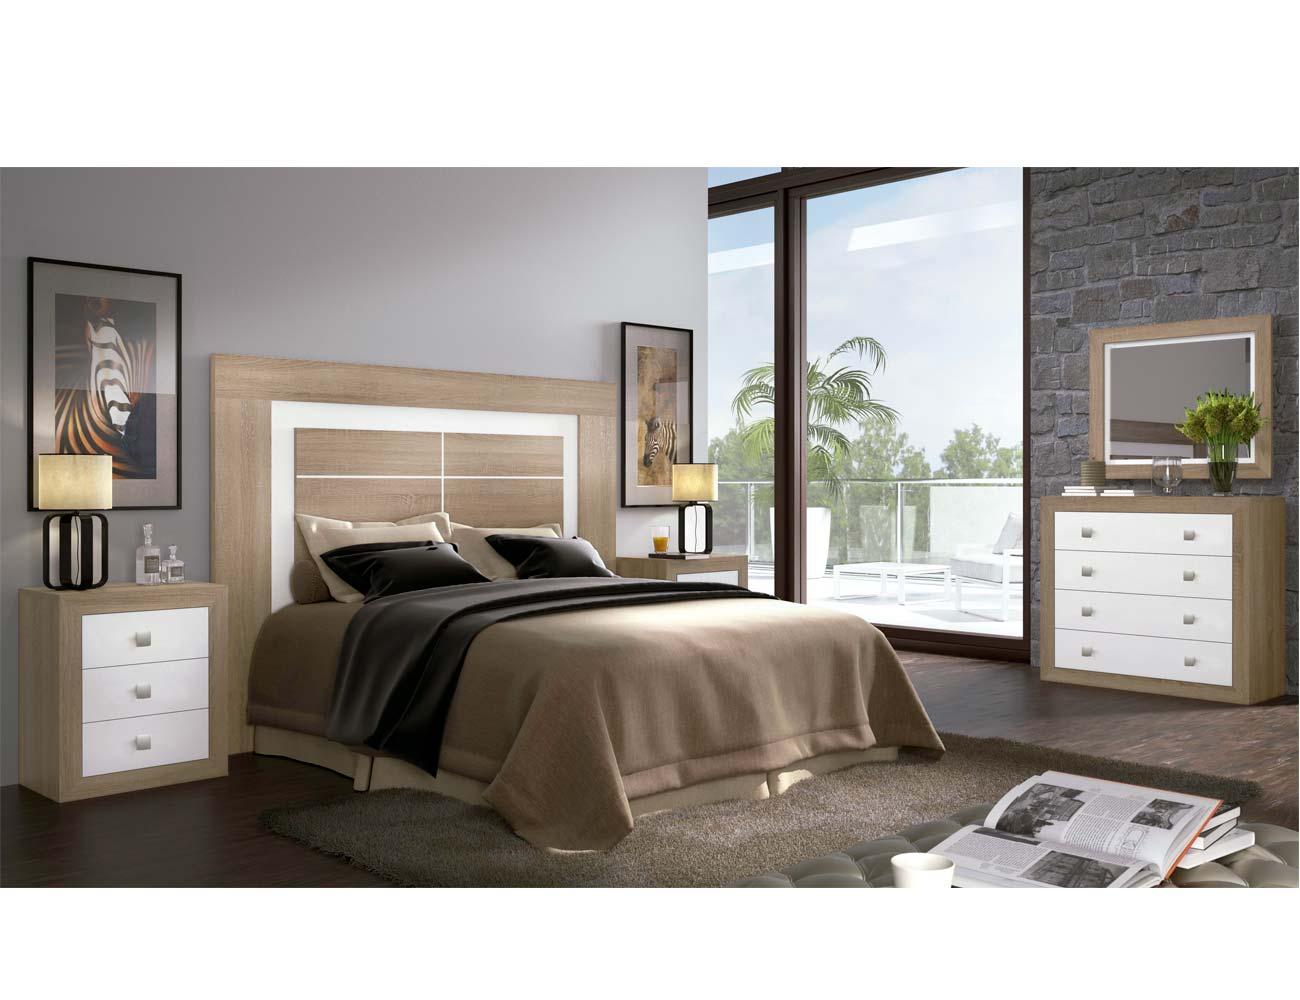 Dormitorio matrimonio moderno 04 color cambrian blanco